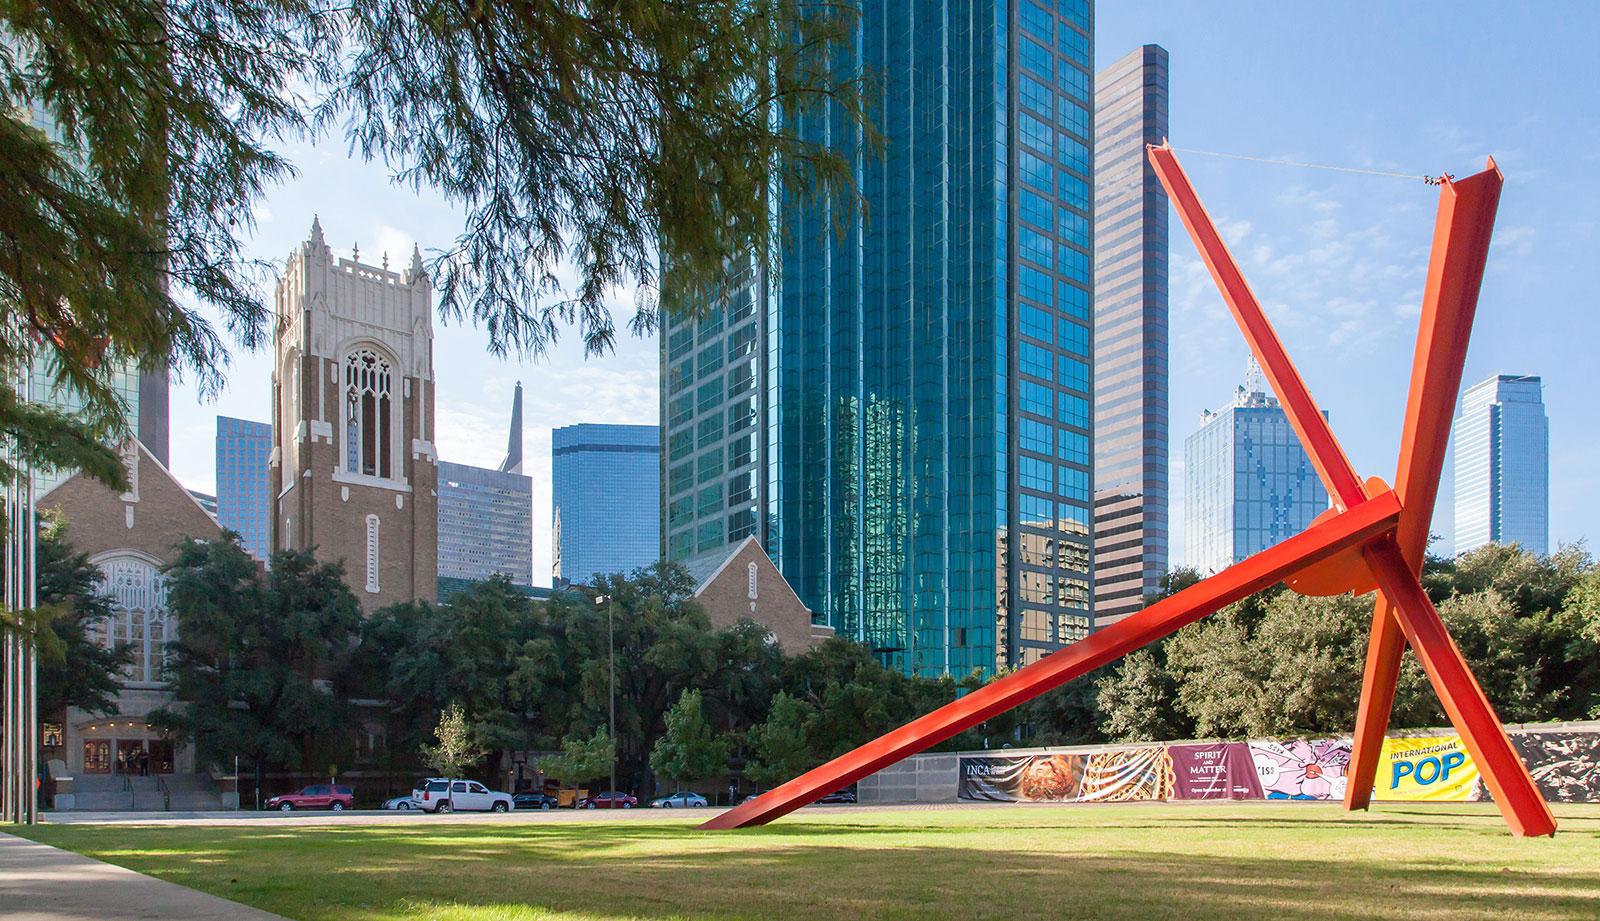 Dallas Arts District First United Methodist Church